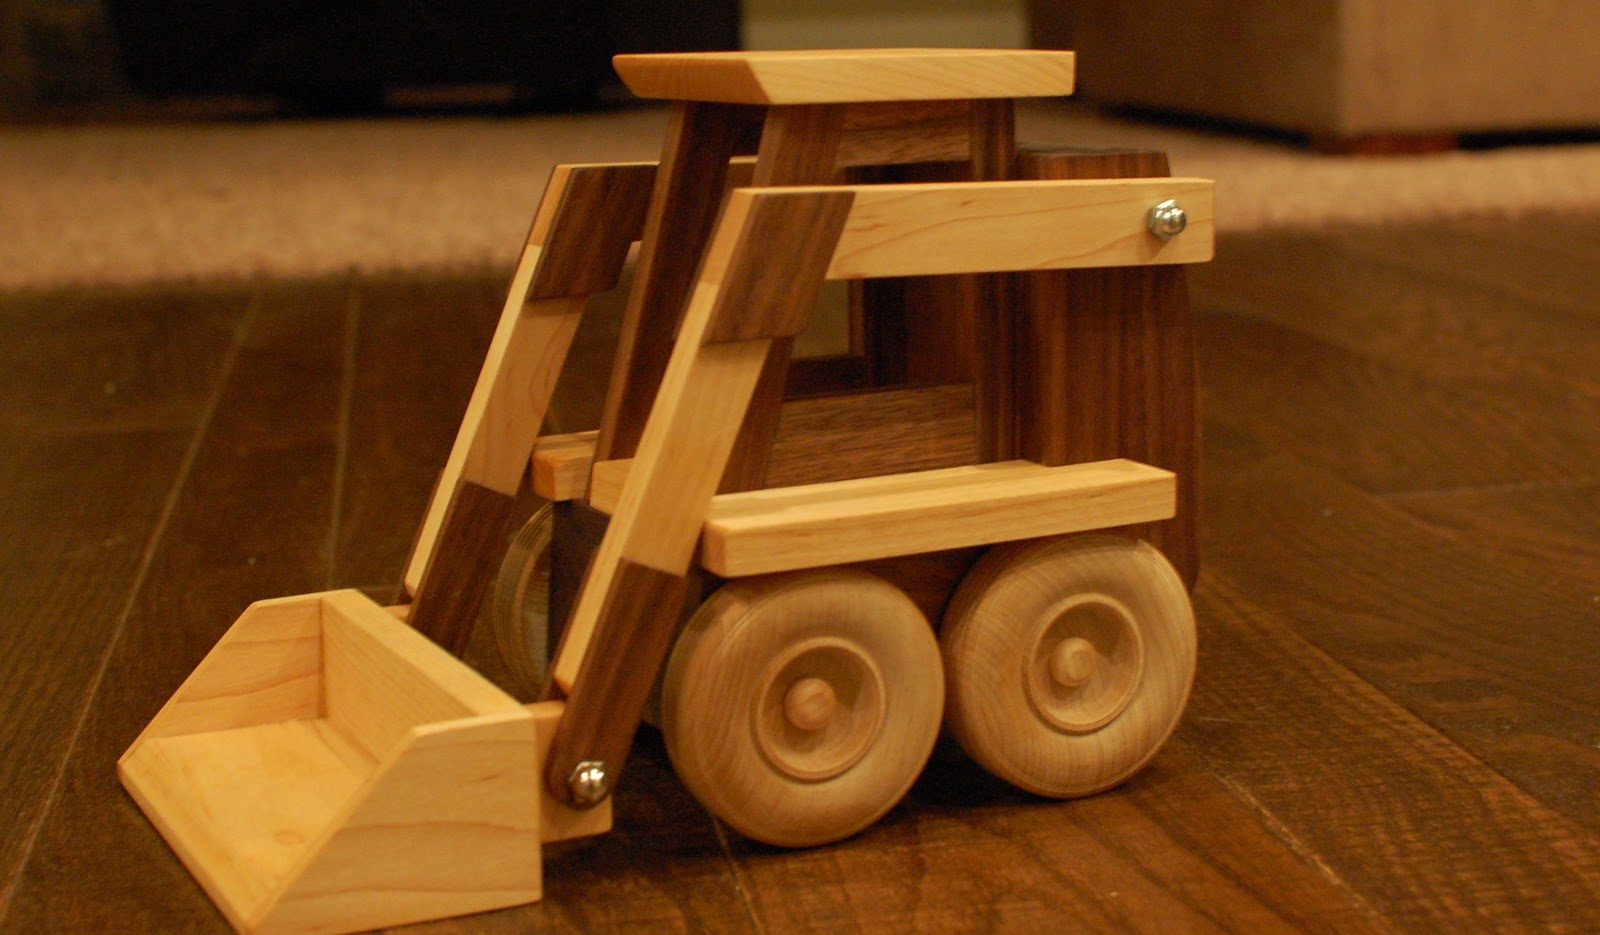 Chad's Workshop: Toy Wooden Skid Loader